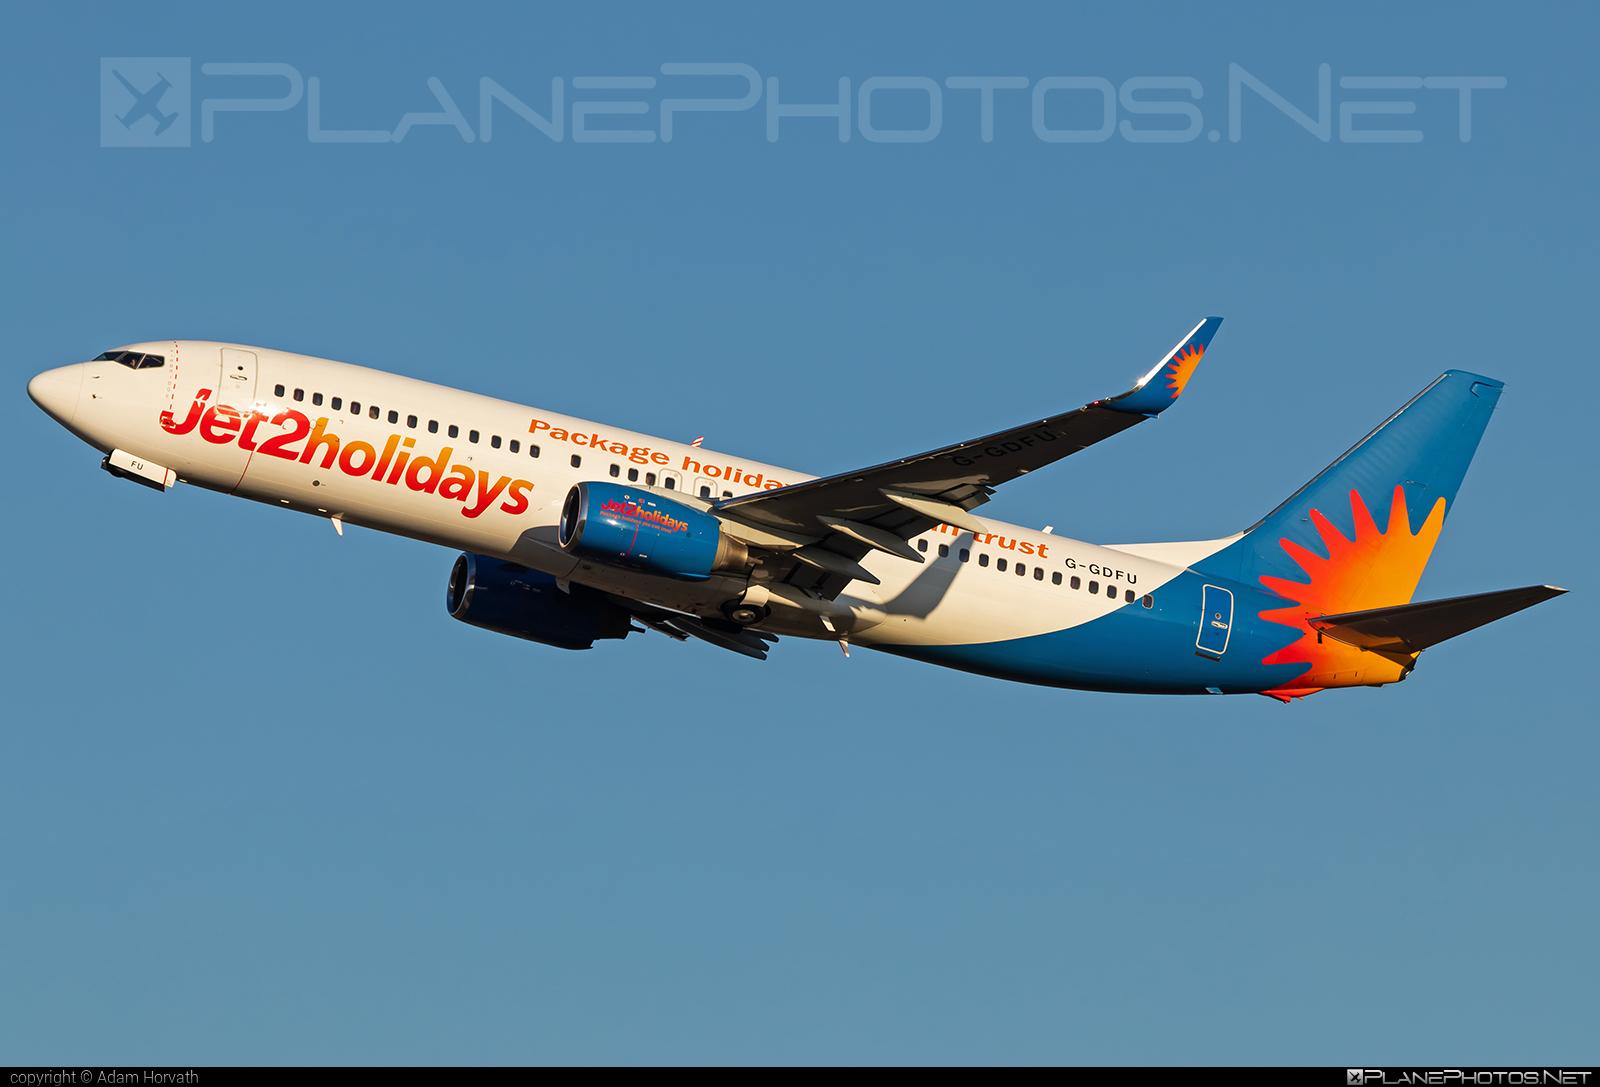 Boeing 737-800 - G-GDFU operated by Jet2 #b737 #b737nextgen #b737ng #boeing #boeing737 #jet2